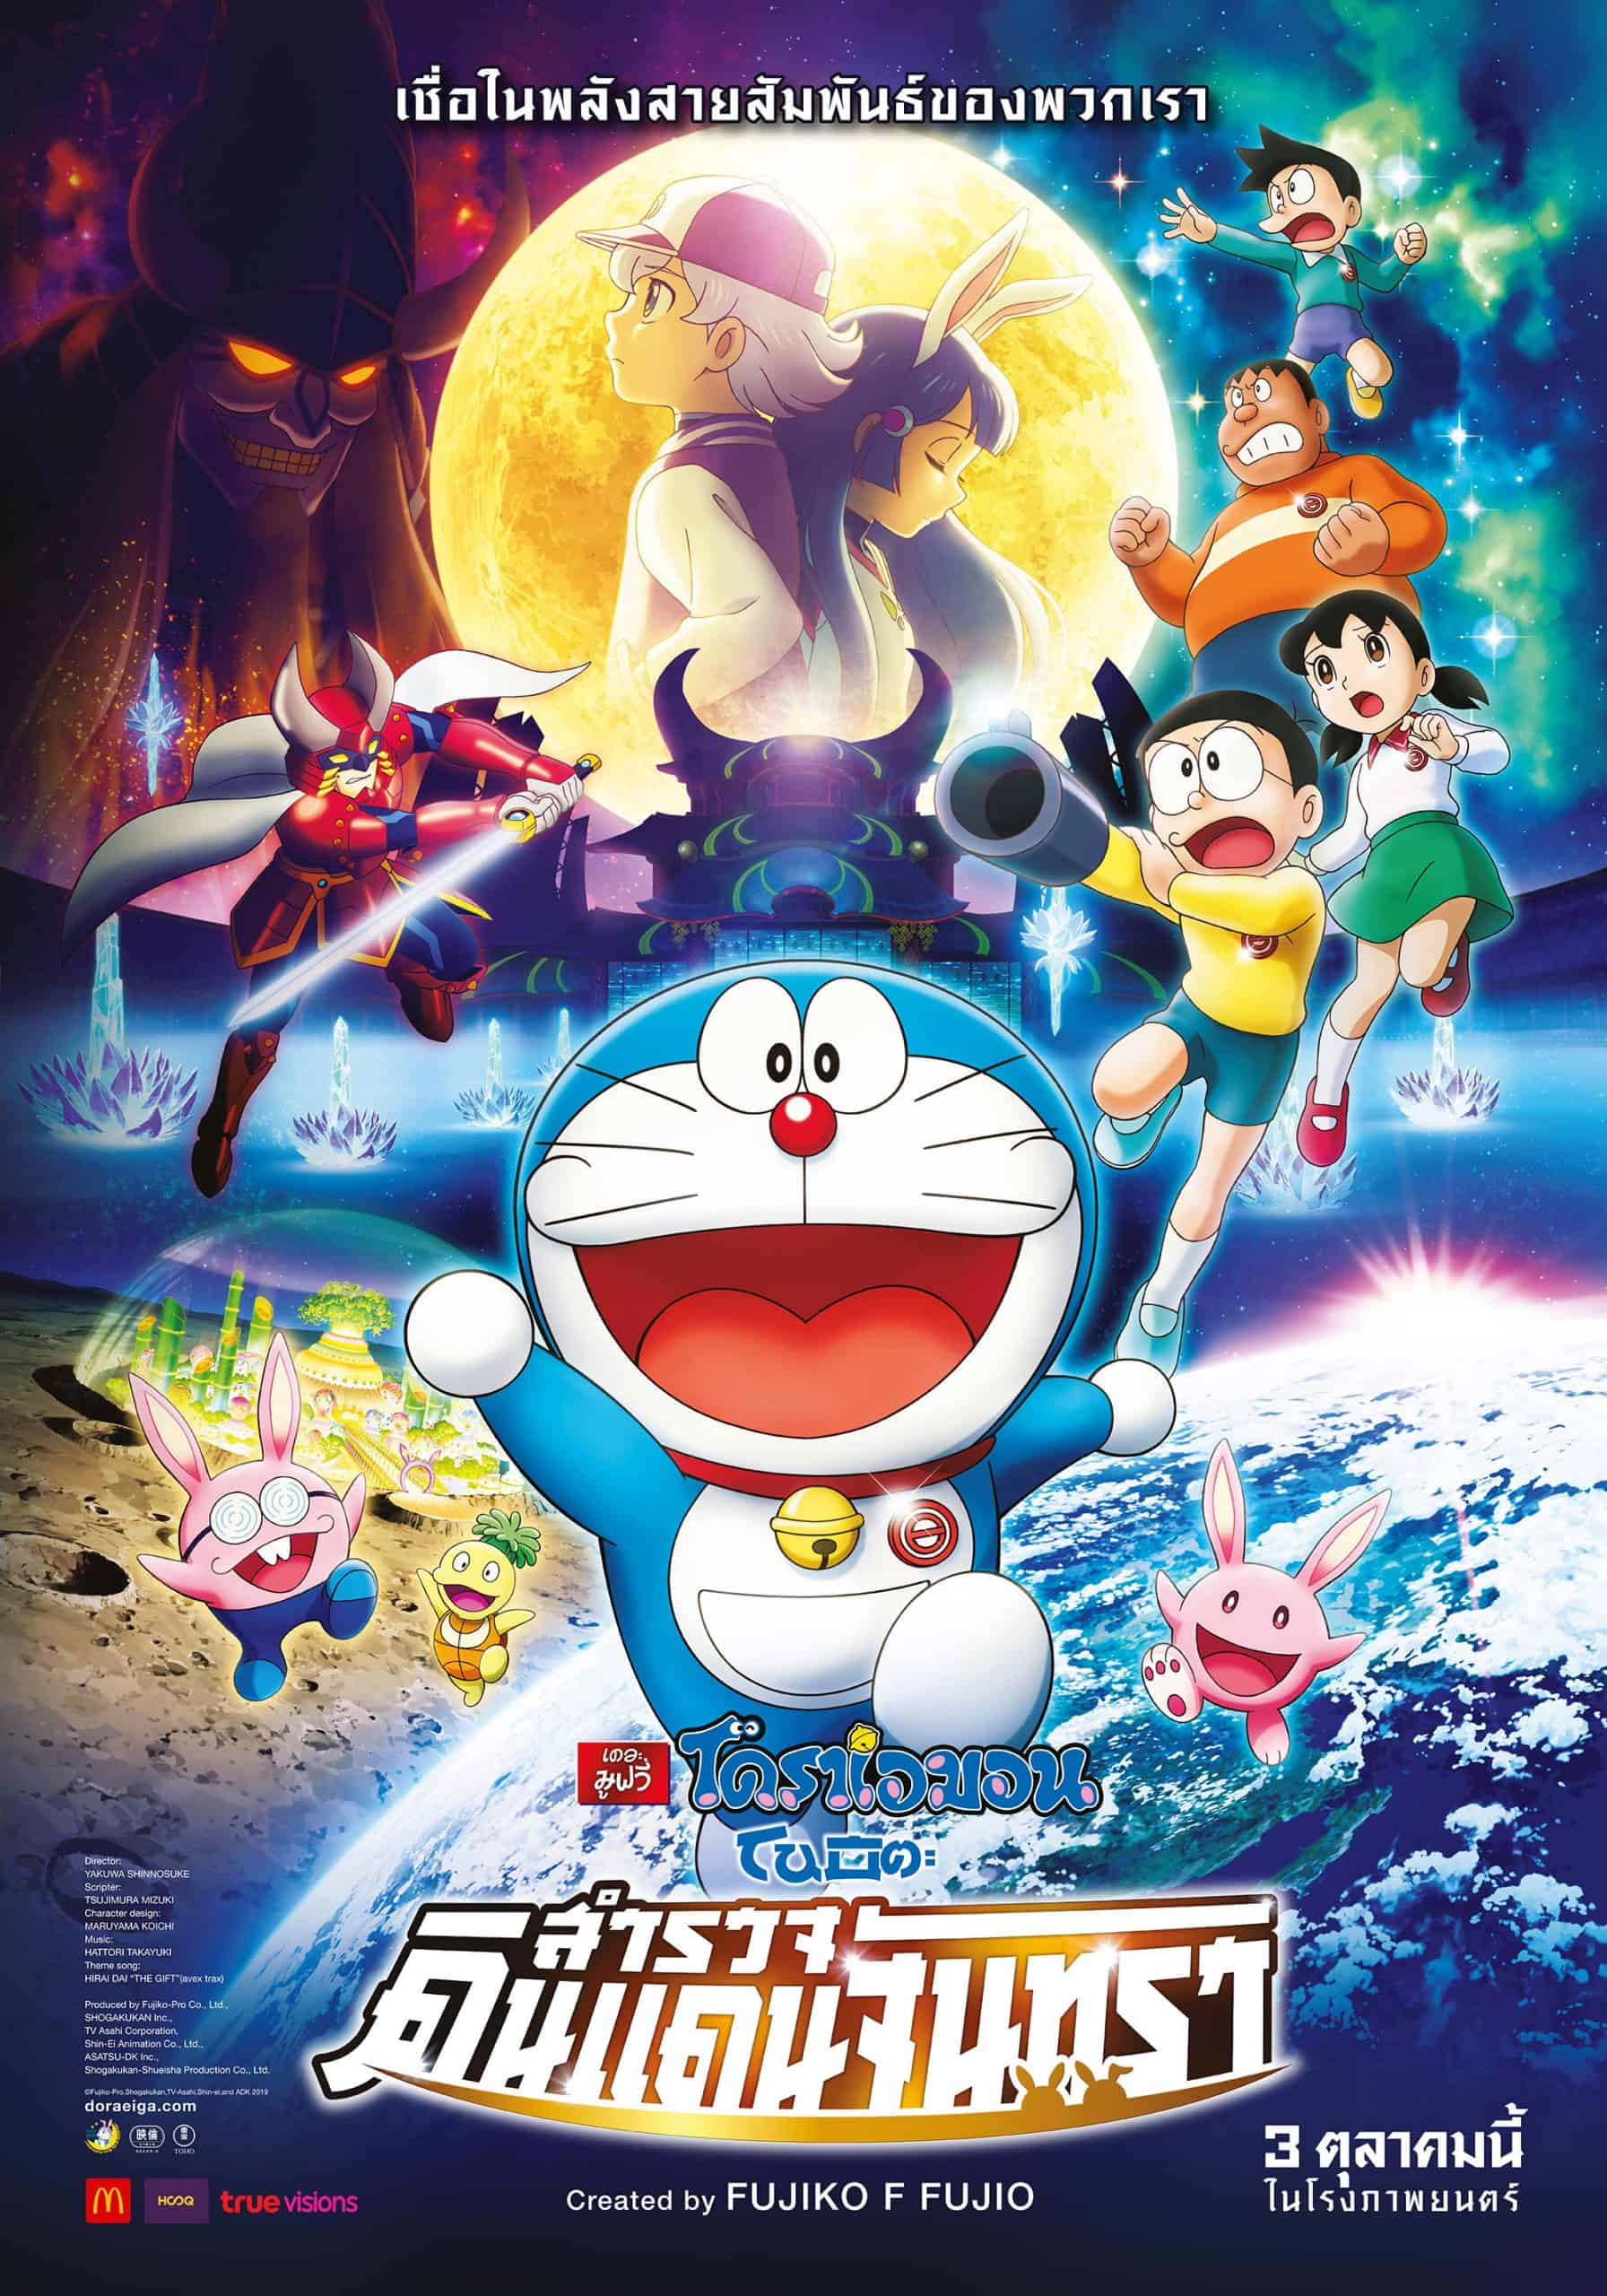 Doraemon: Nobita's Chronicle of the Moon Exploration โดราเอม่อนเดอะมูฟวี่ โนบิตะสำรวจดินแดนจันทรา (2019)